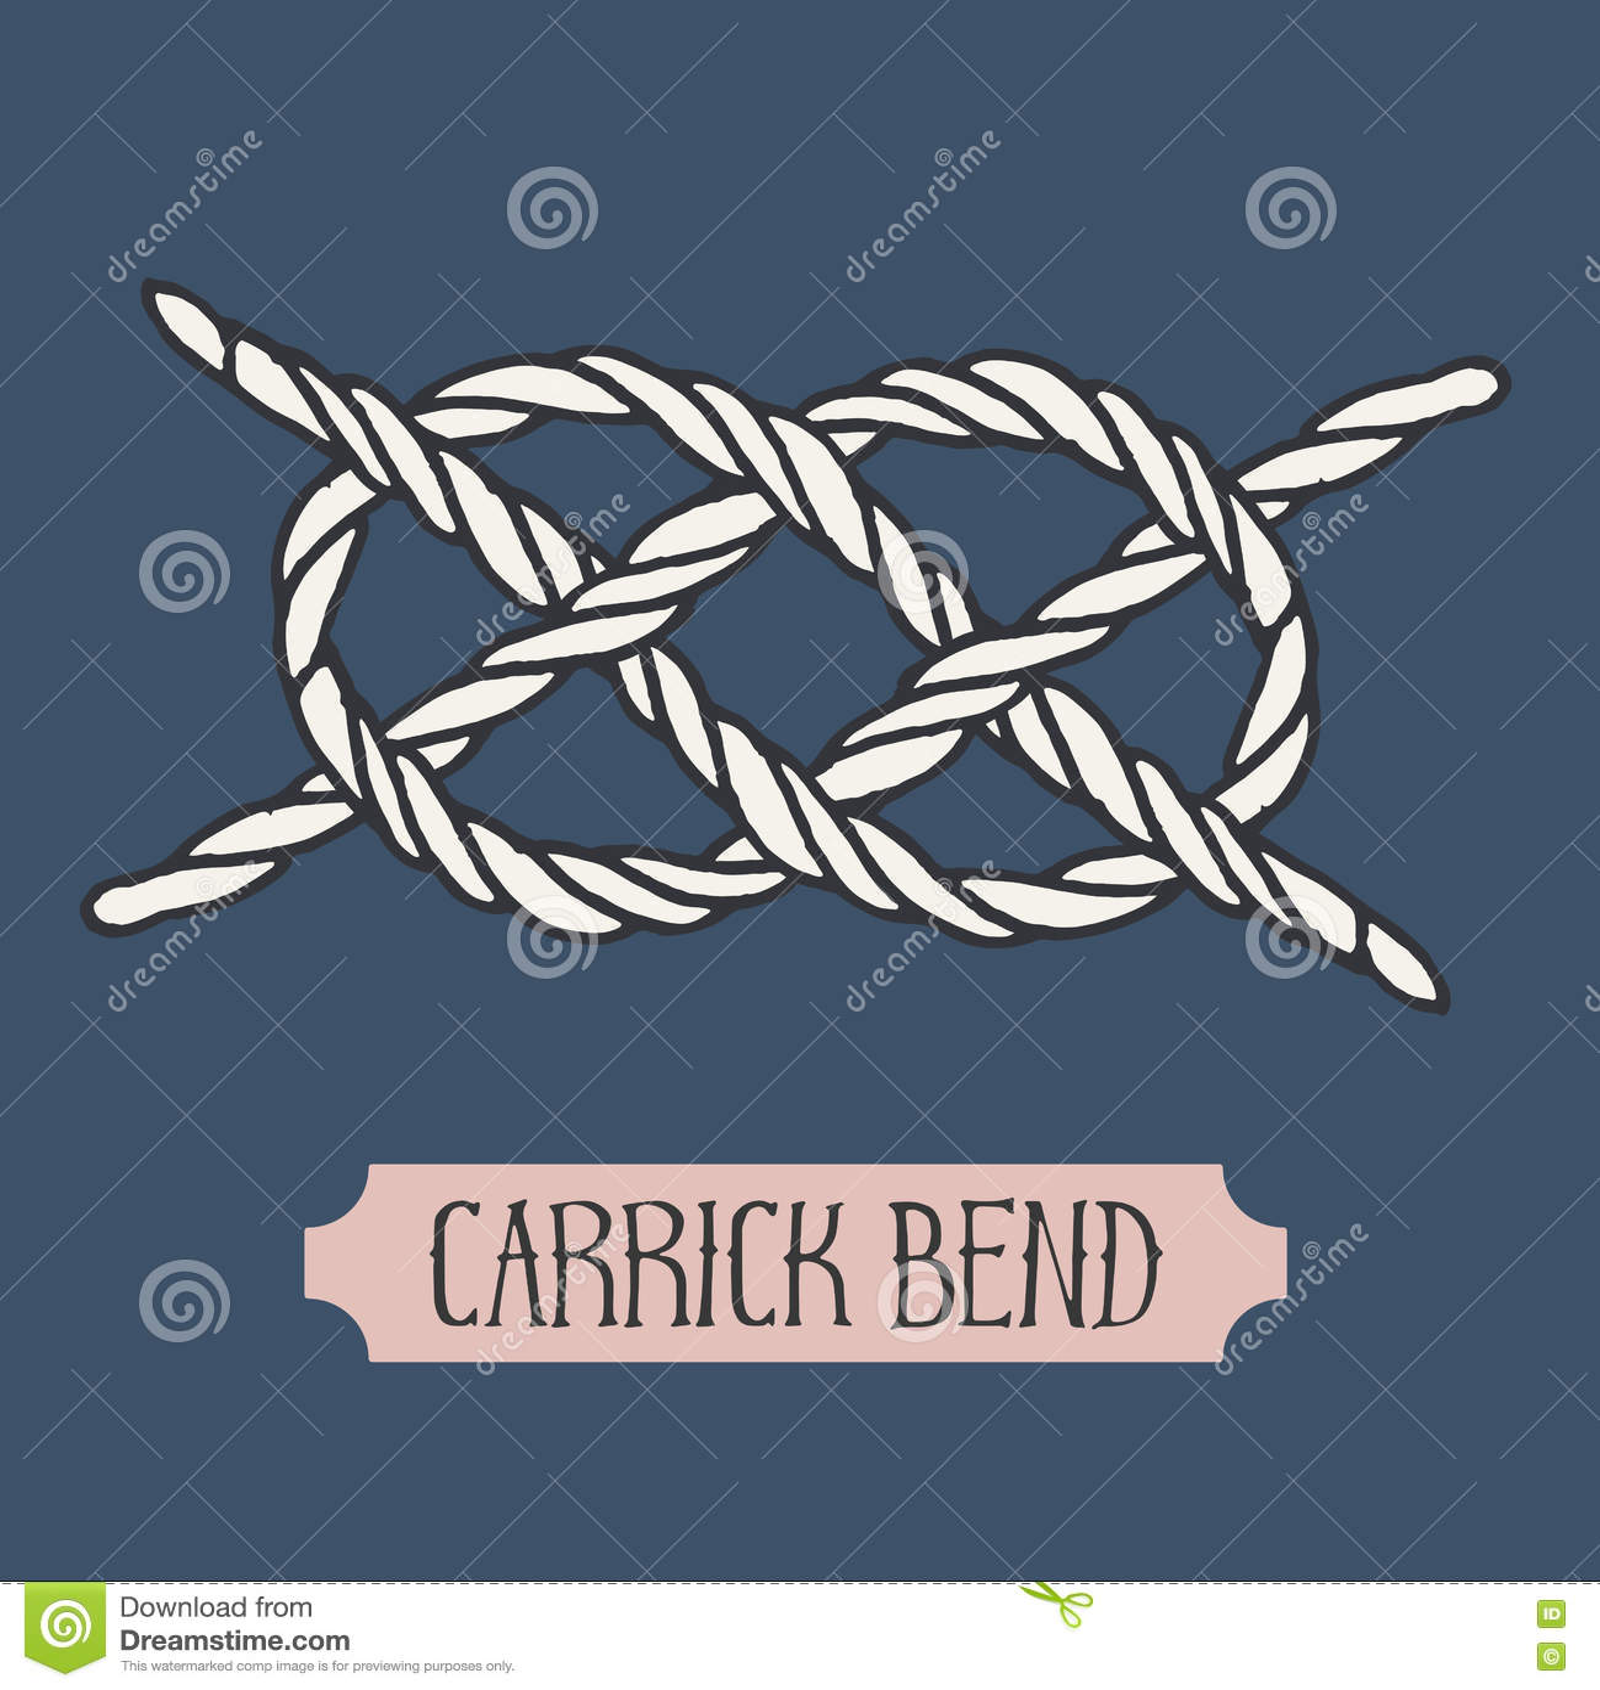 Single Illustration Of Nautical Knot  Stock Vector - Illustration of